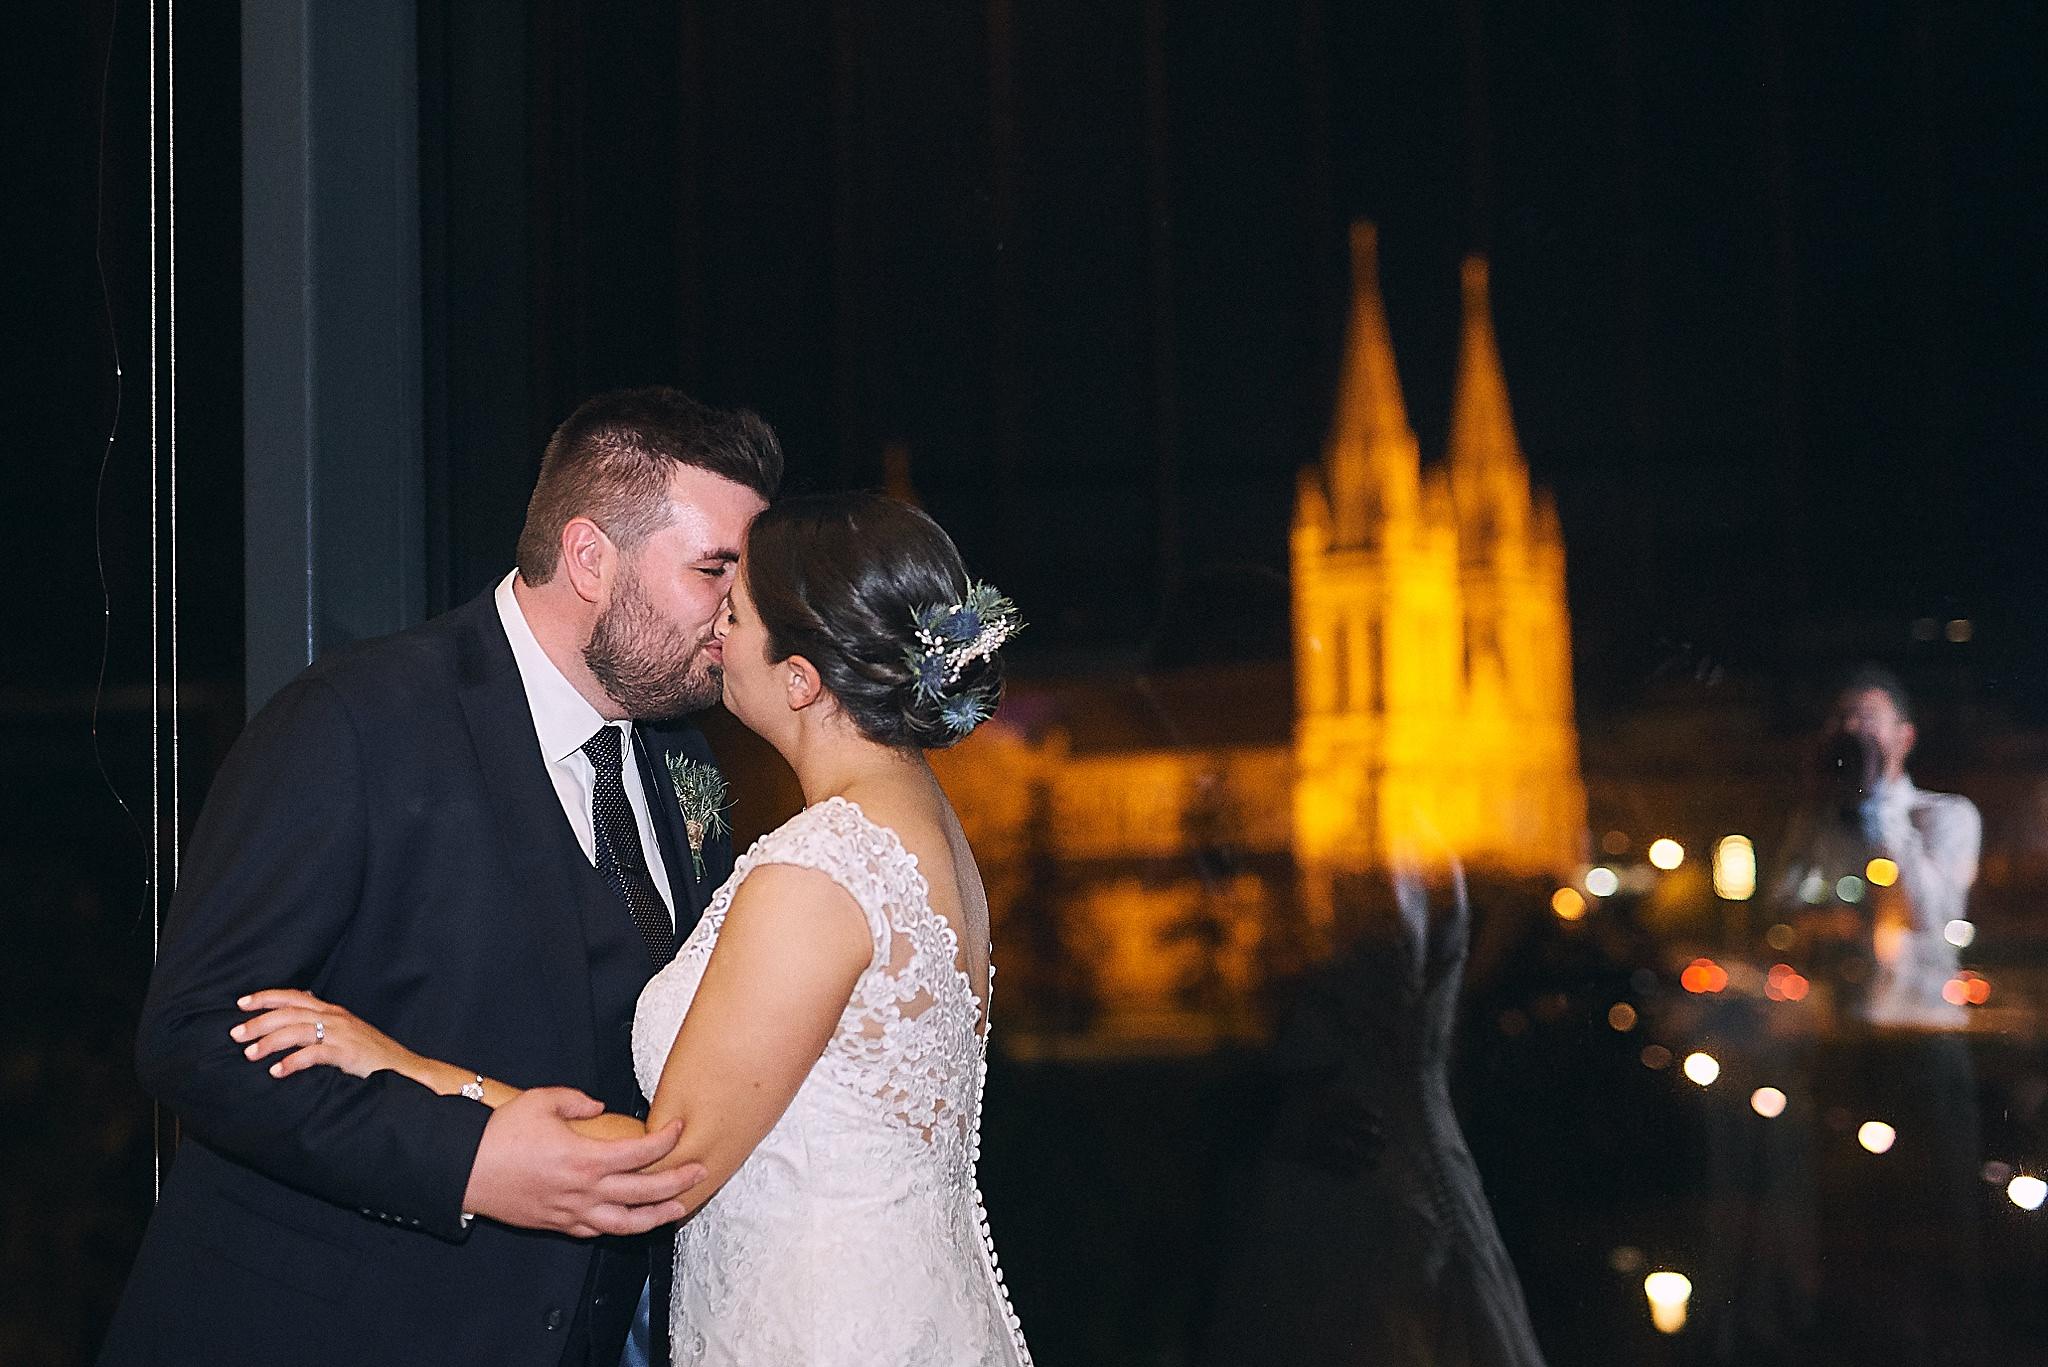 Adelaide_oval_wedding_0012.jpg